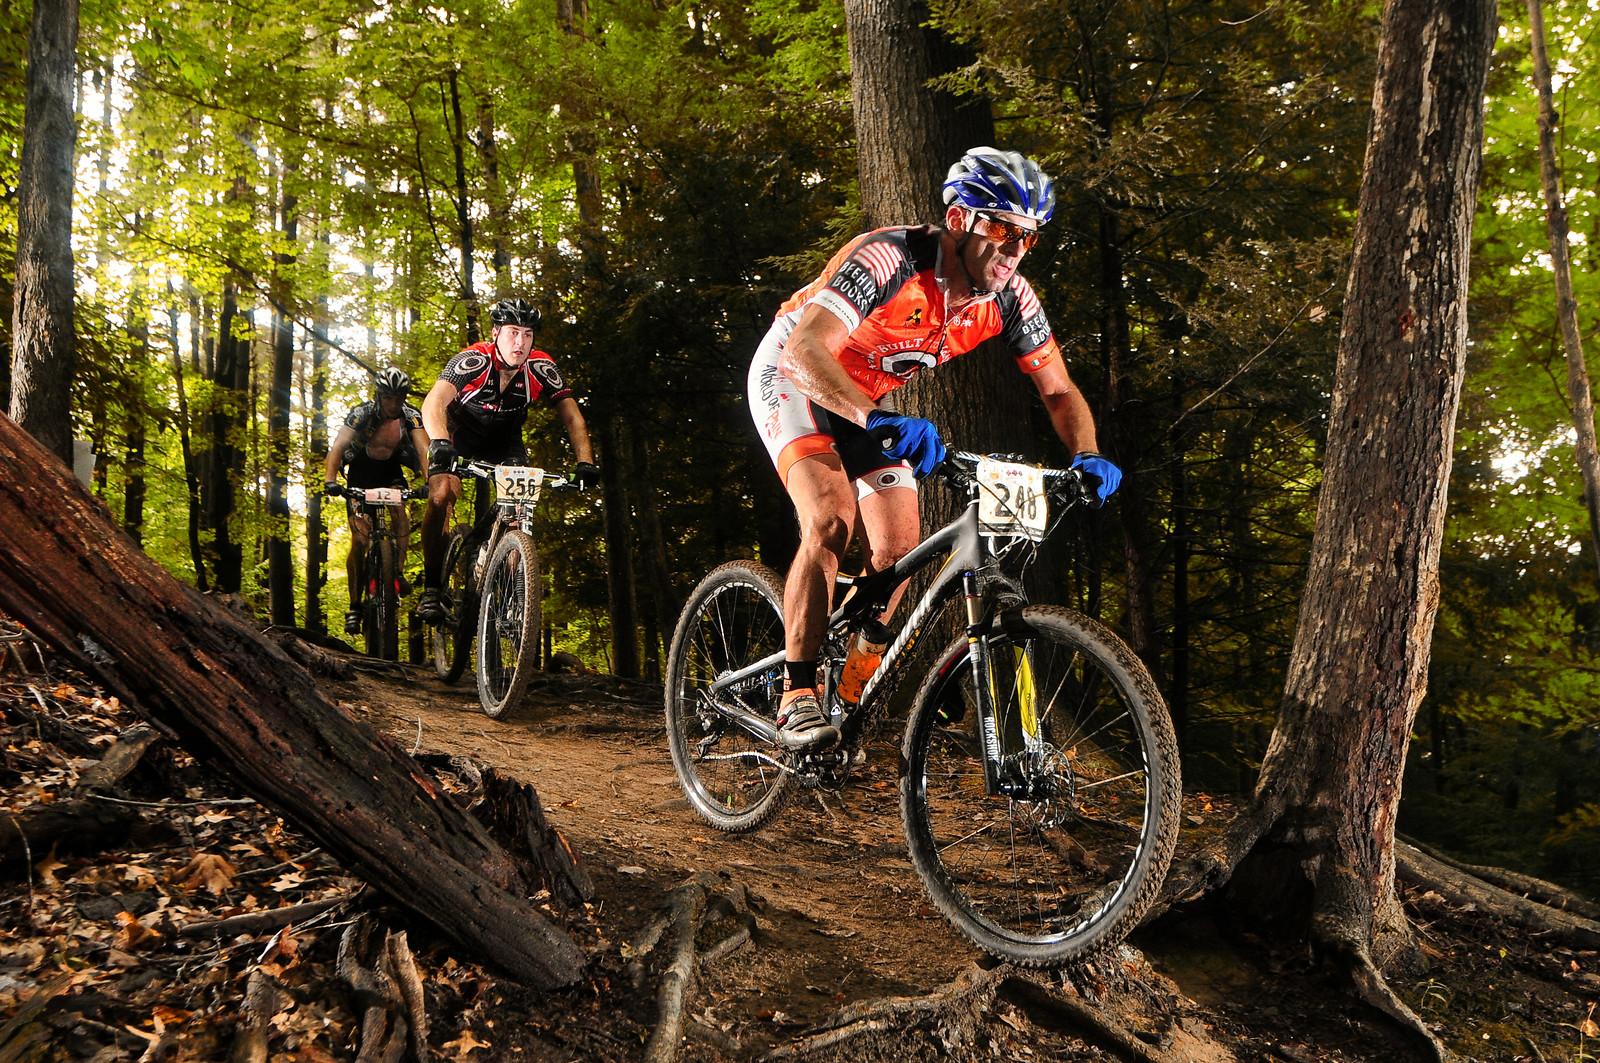 BVR SE A 0049 - AllMountainImaging - Mountain Biking Pictures - Vital MTB